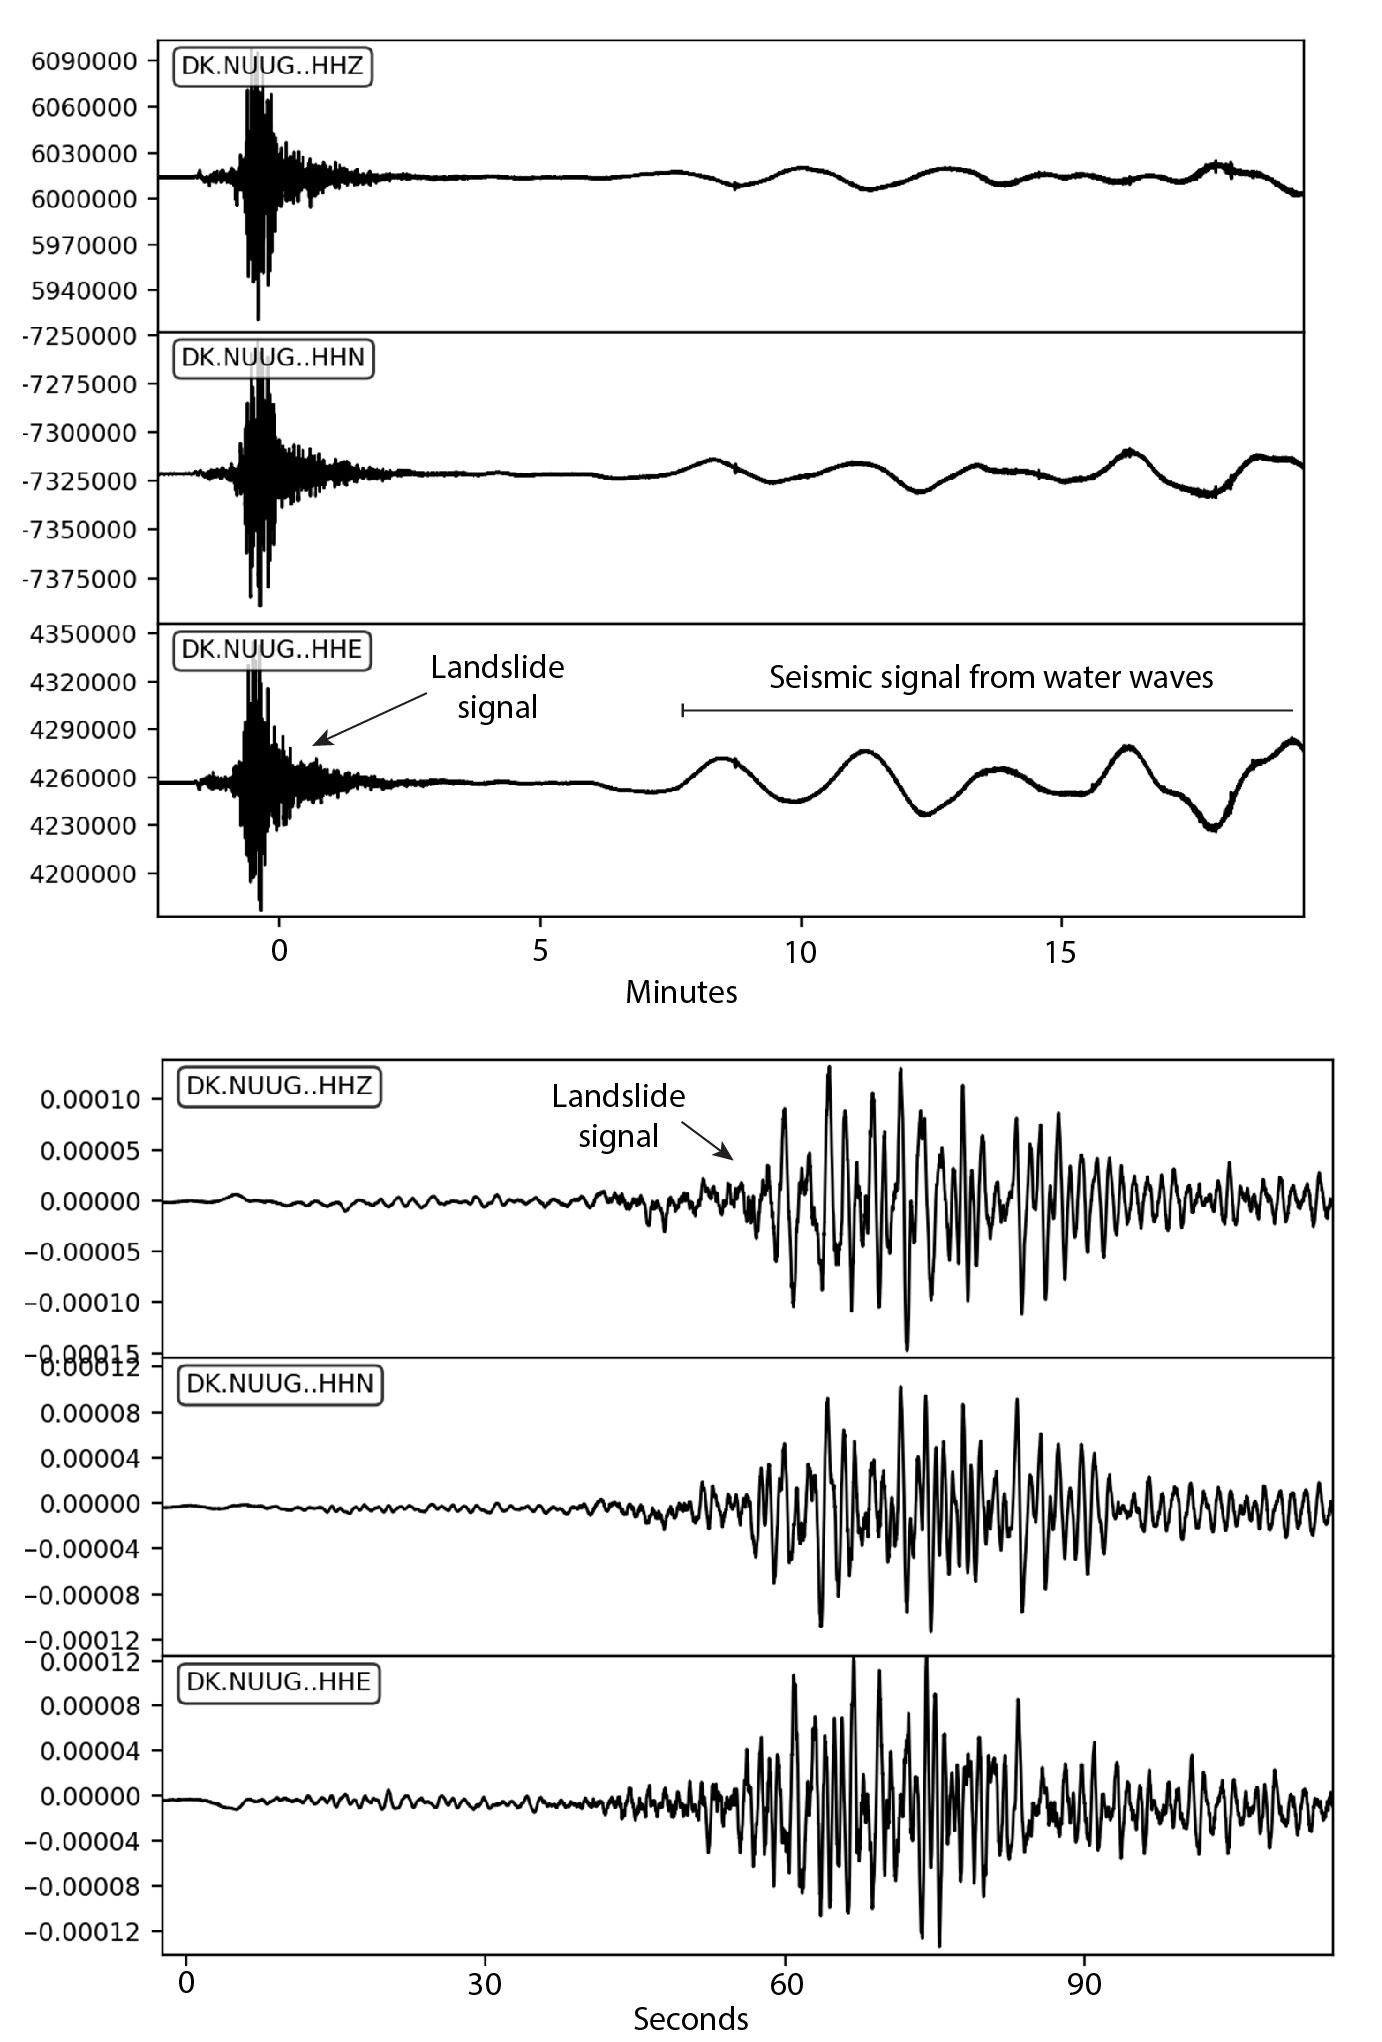 seismic-signals-greenland-landslide-greenland-tsunami